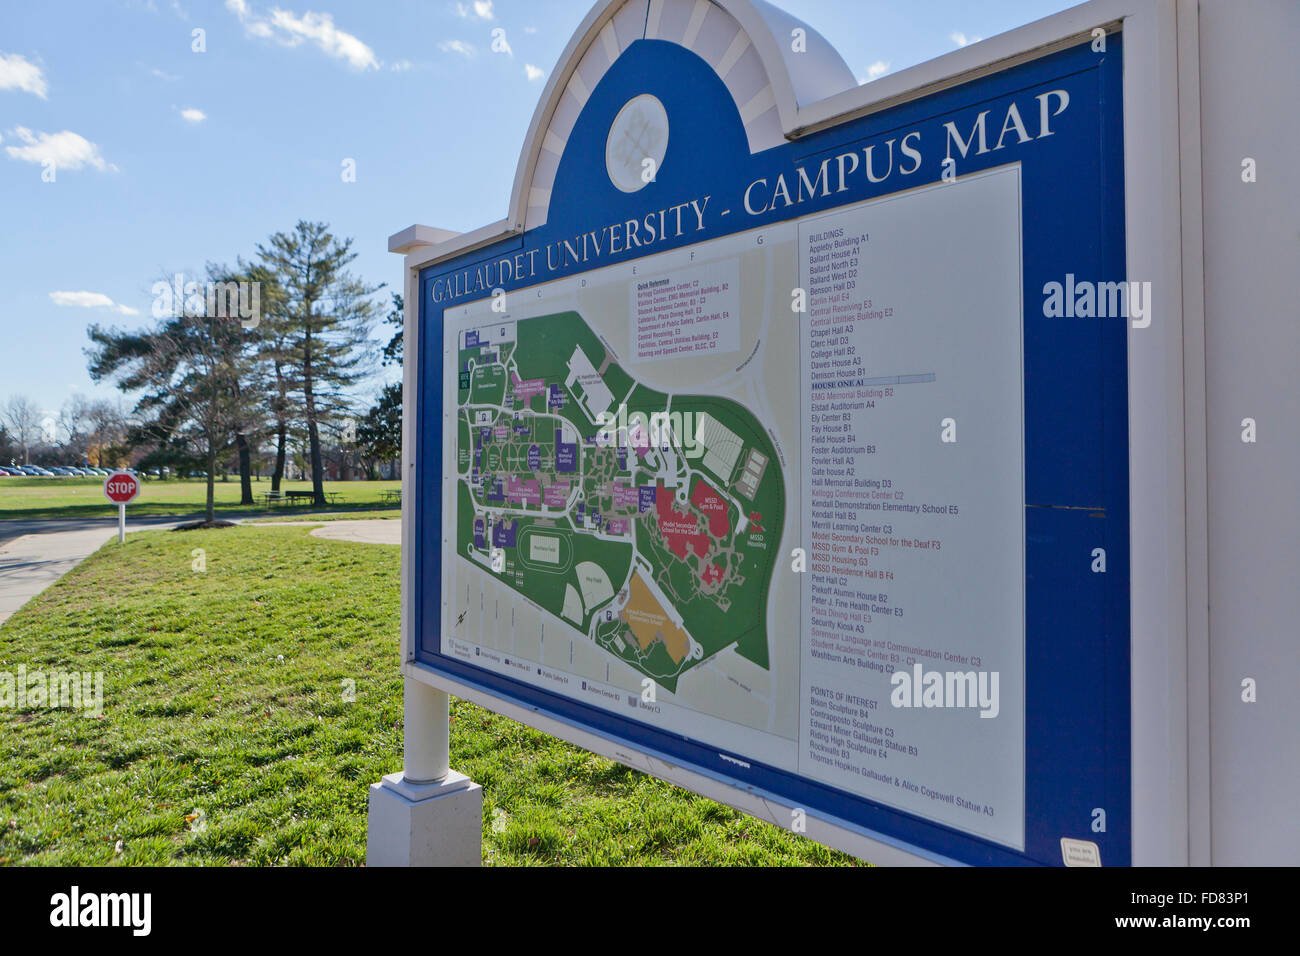 Gallaudet University campus map Washington DC USA Stock Photo